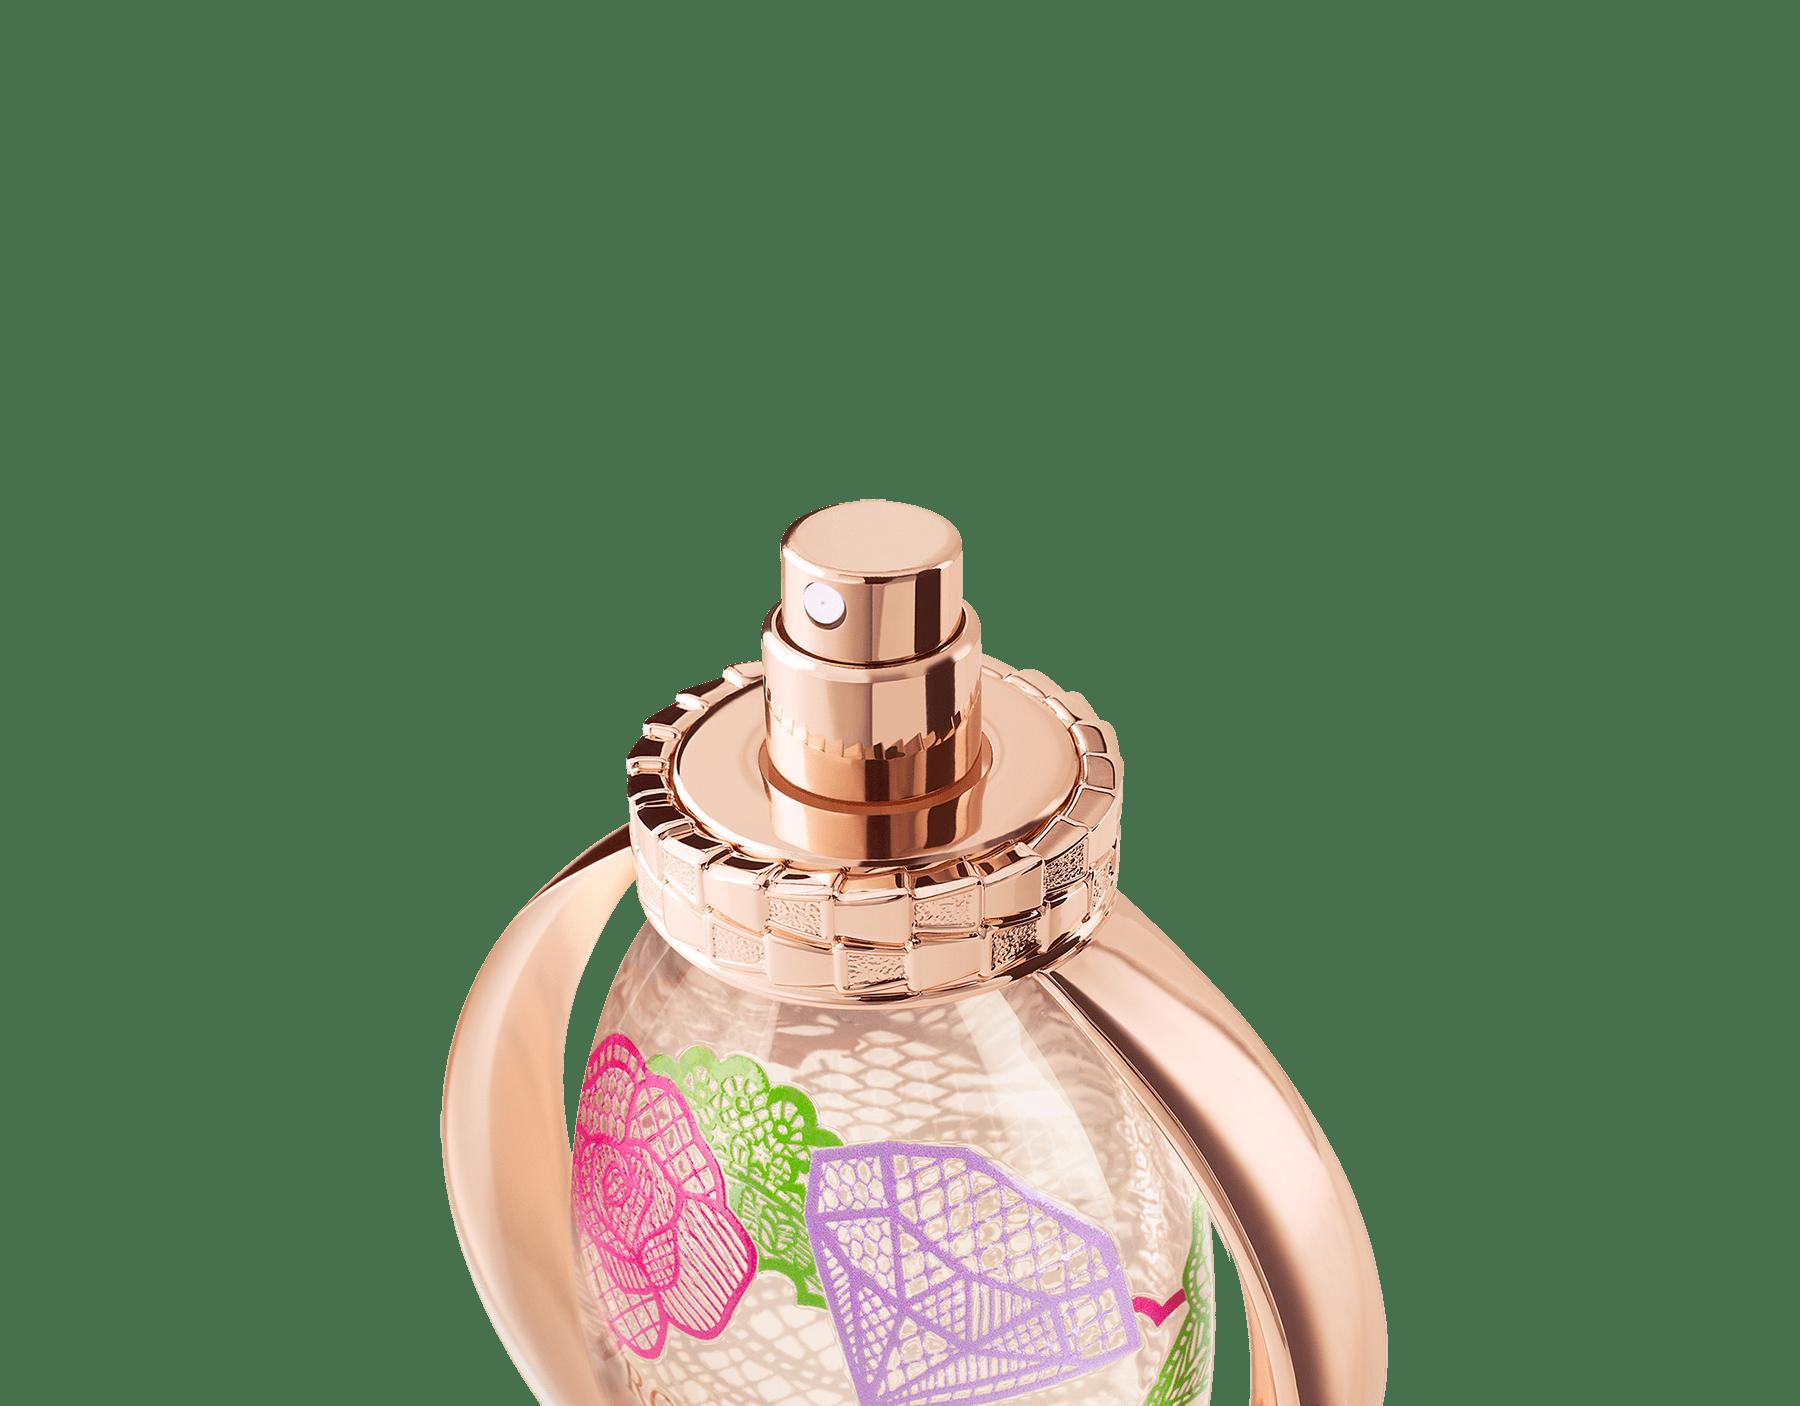 A new Limited Edition in collaboration with a Korean artist, Kathleen Kye, encapsulating the original Rose Goldea Eau de Parfum. 41150 image 4